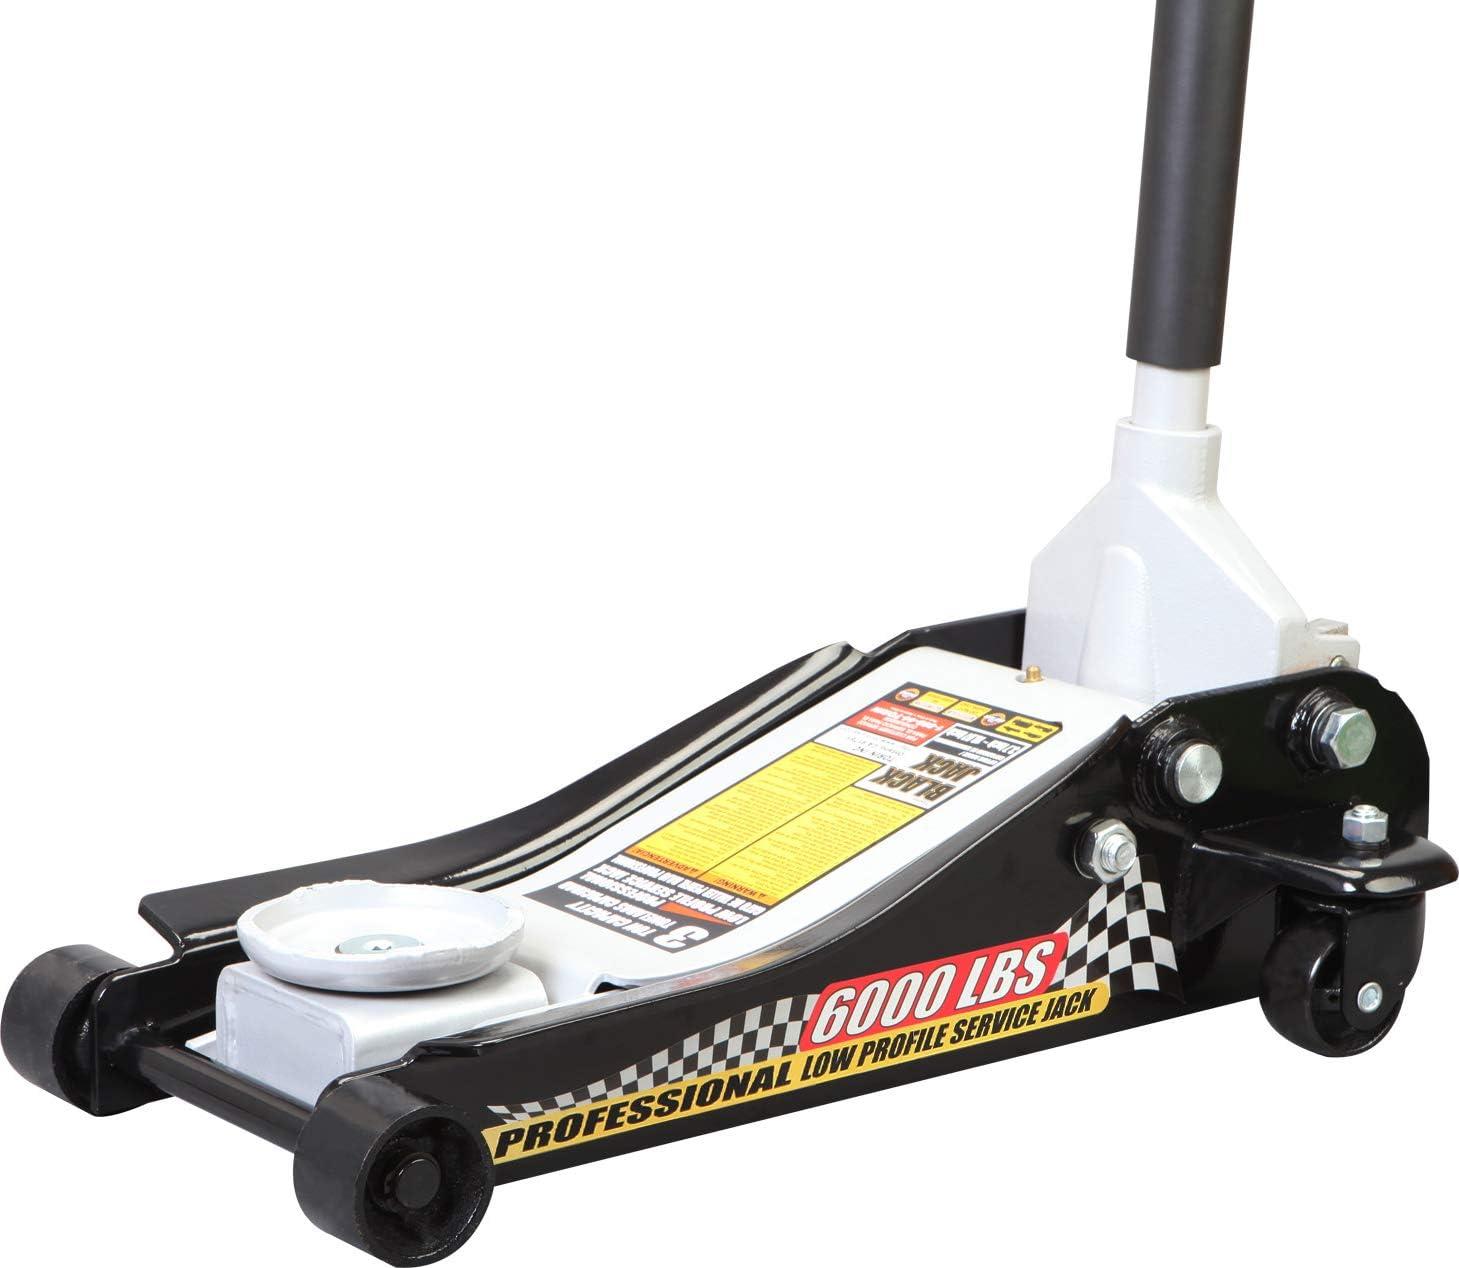 Torin T83505W Blackjack Hydraulic Low Profile Steel Racing Floor Jack with Single Piston Quick Lift Pump, 3 Ton (6,000 lb) Capacity, Black